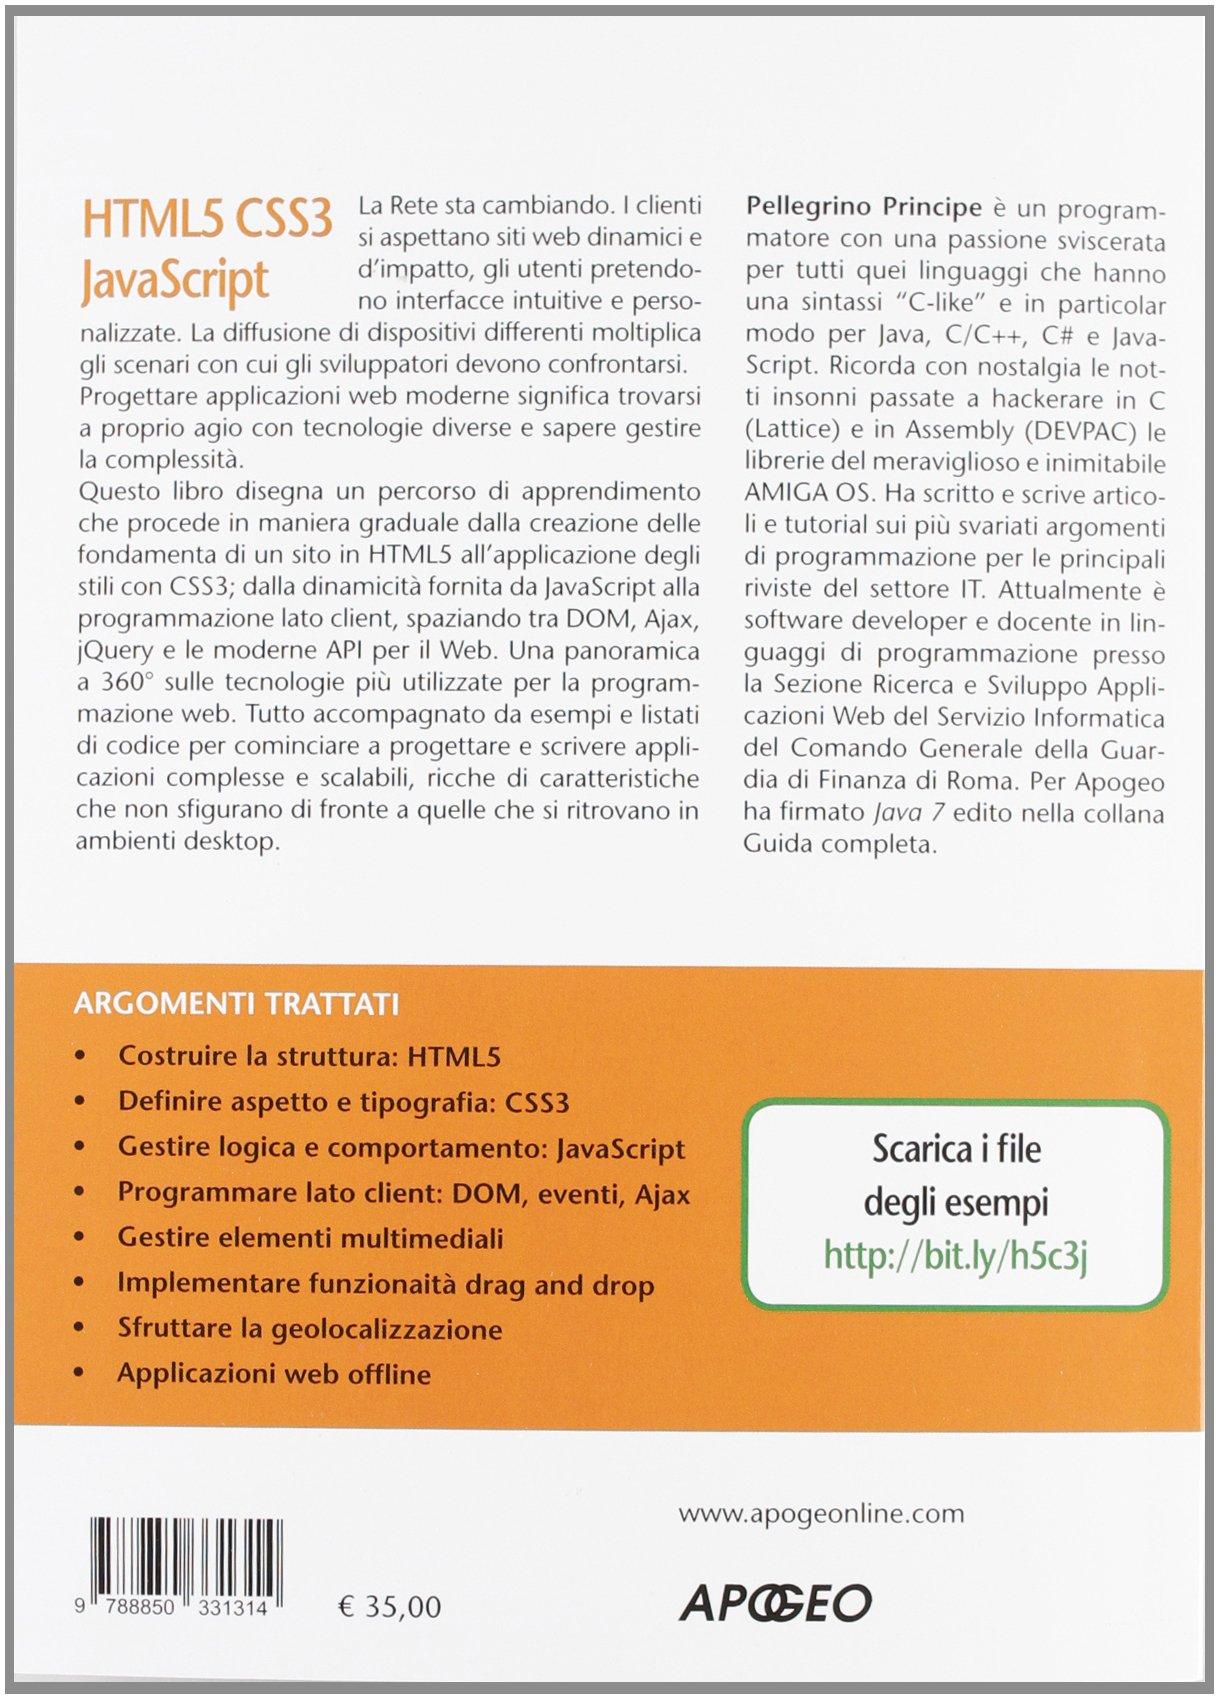 html5 css3 javascript pellegrino principe